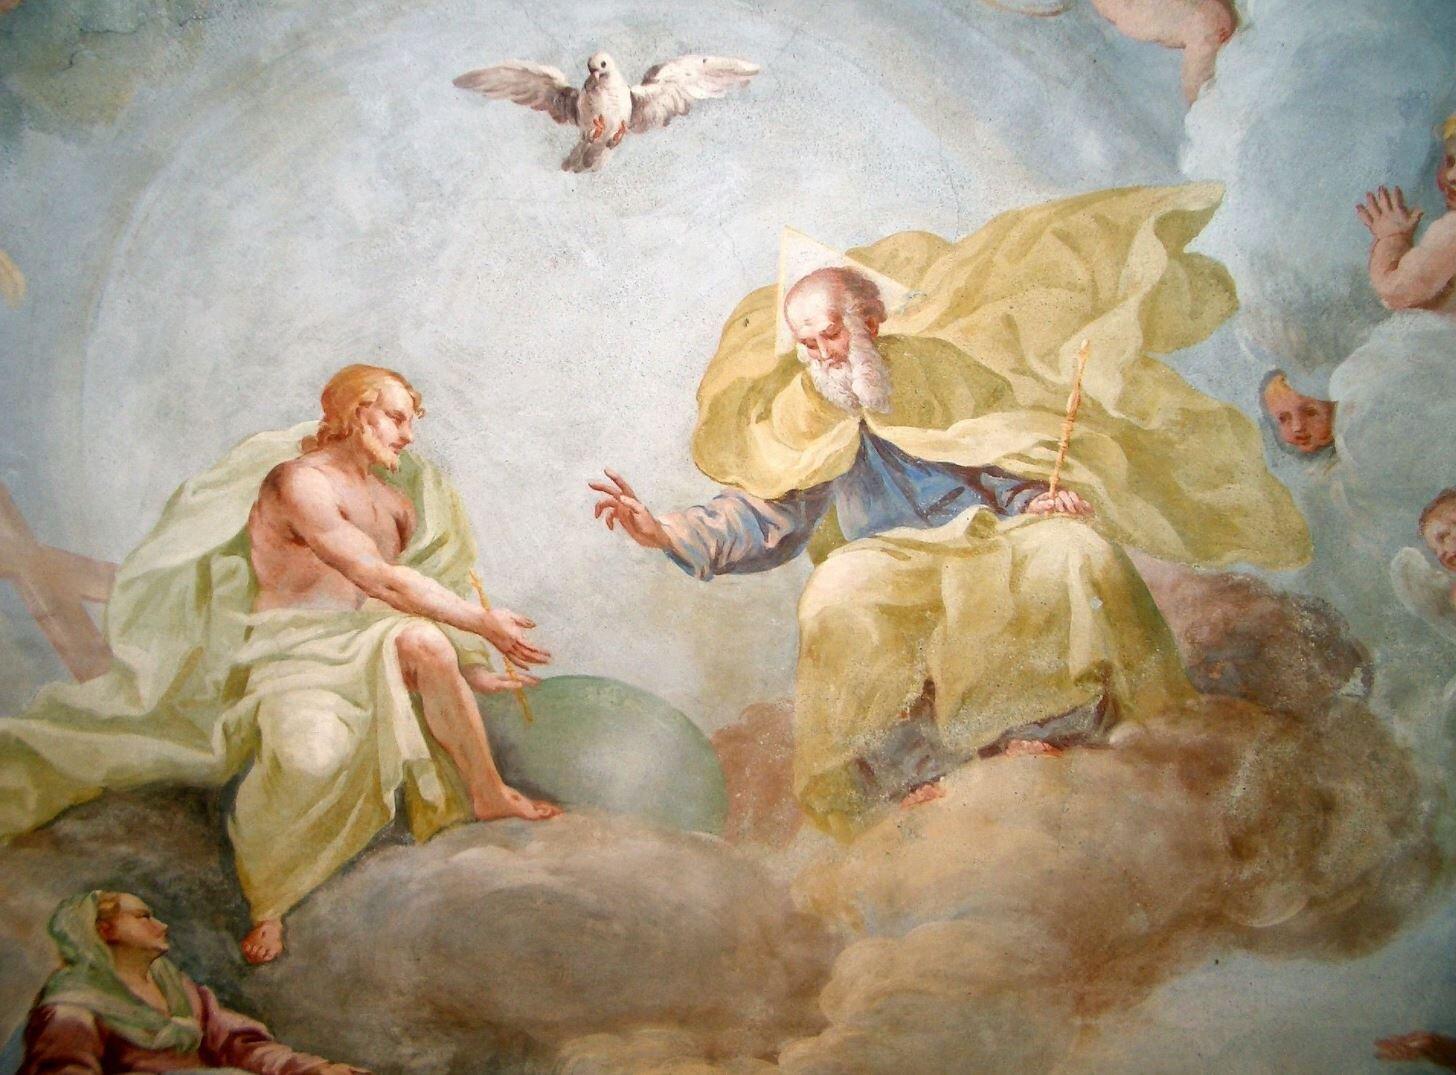 Holy Trinity by Luca Rossetti da Orta, 1738–9 (St. Gaudenzio Church at Ivrea, Torino), Image credit: Laurom, Public domain, via Wikimedia Commons